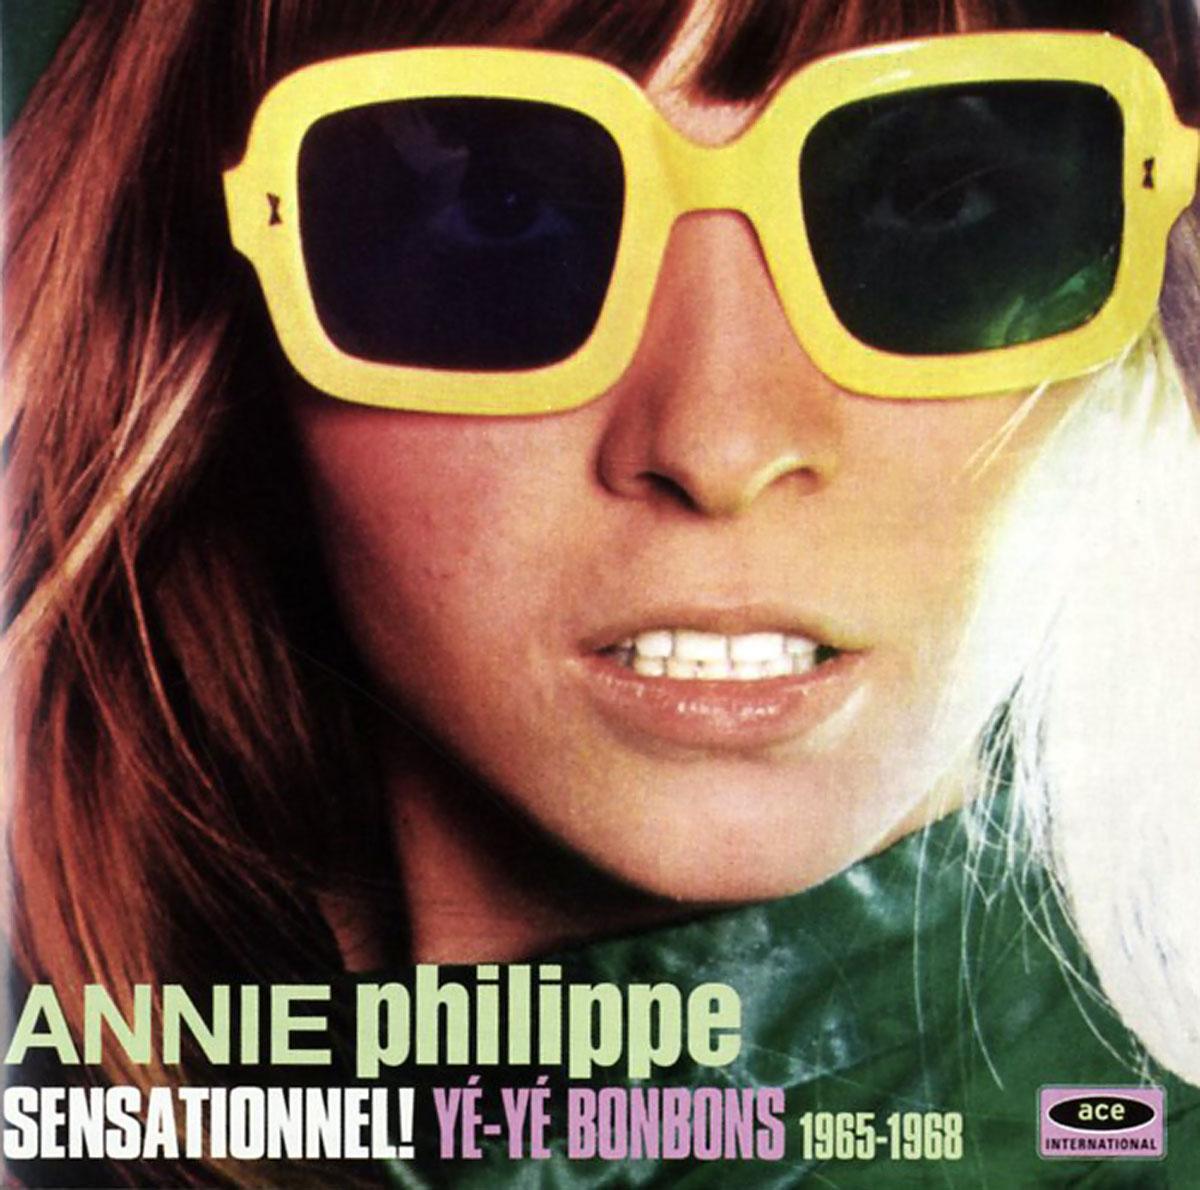 Анни Филипп Annie Philippe. Sensationnel! Ye-Ye Bonbons 1965-1968